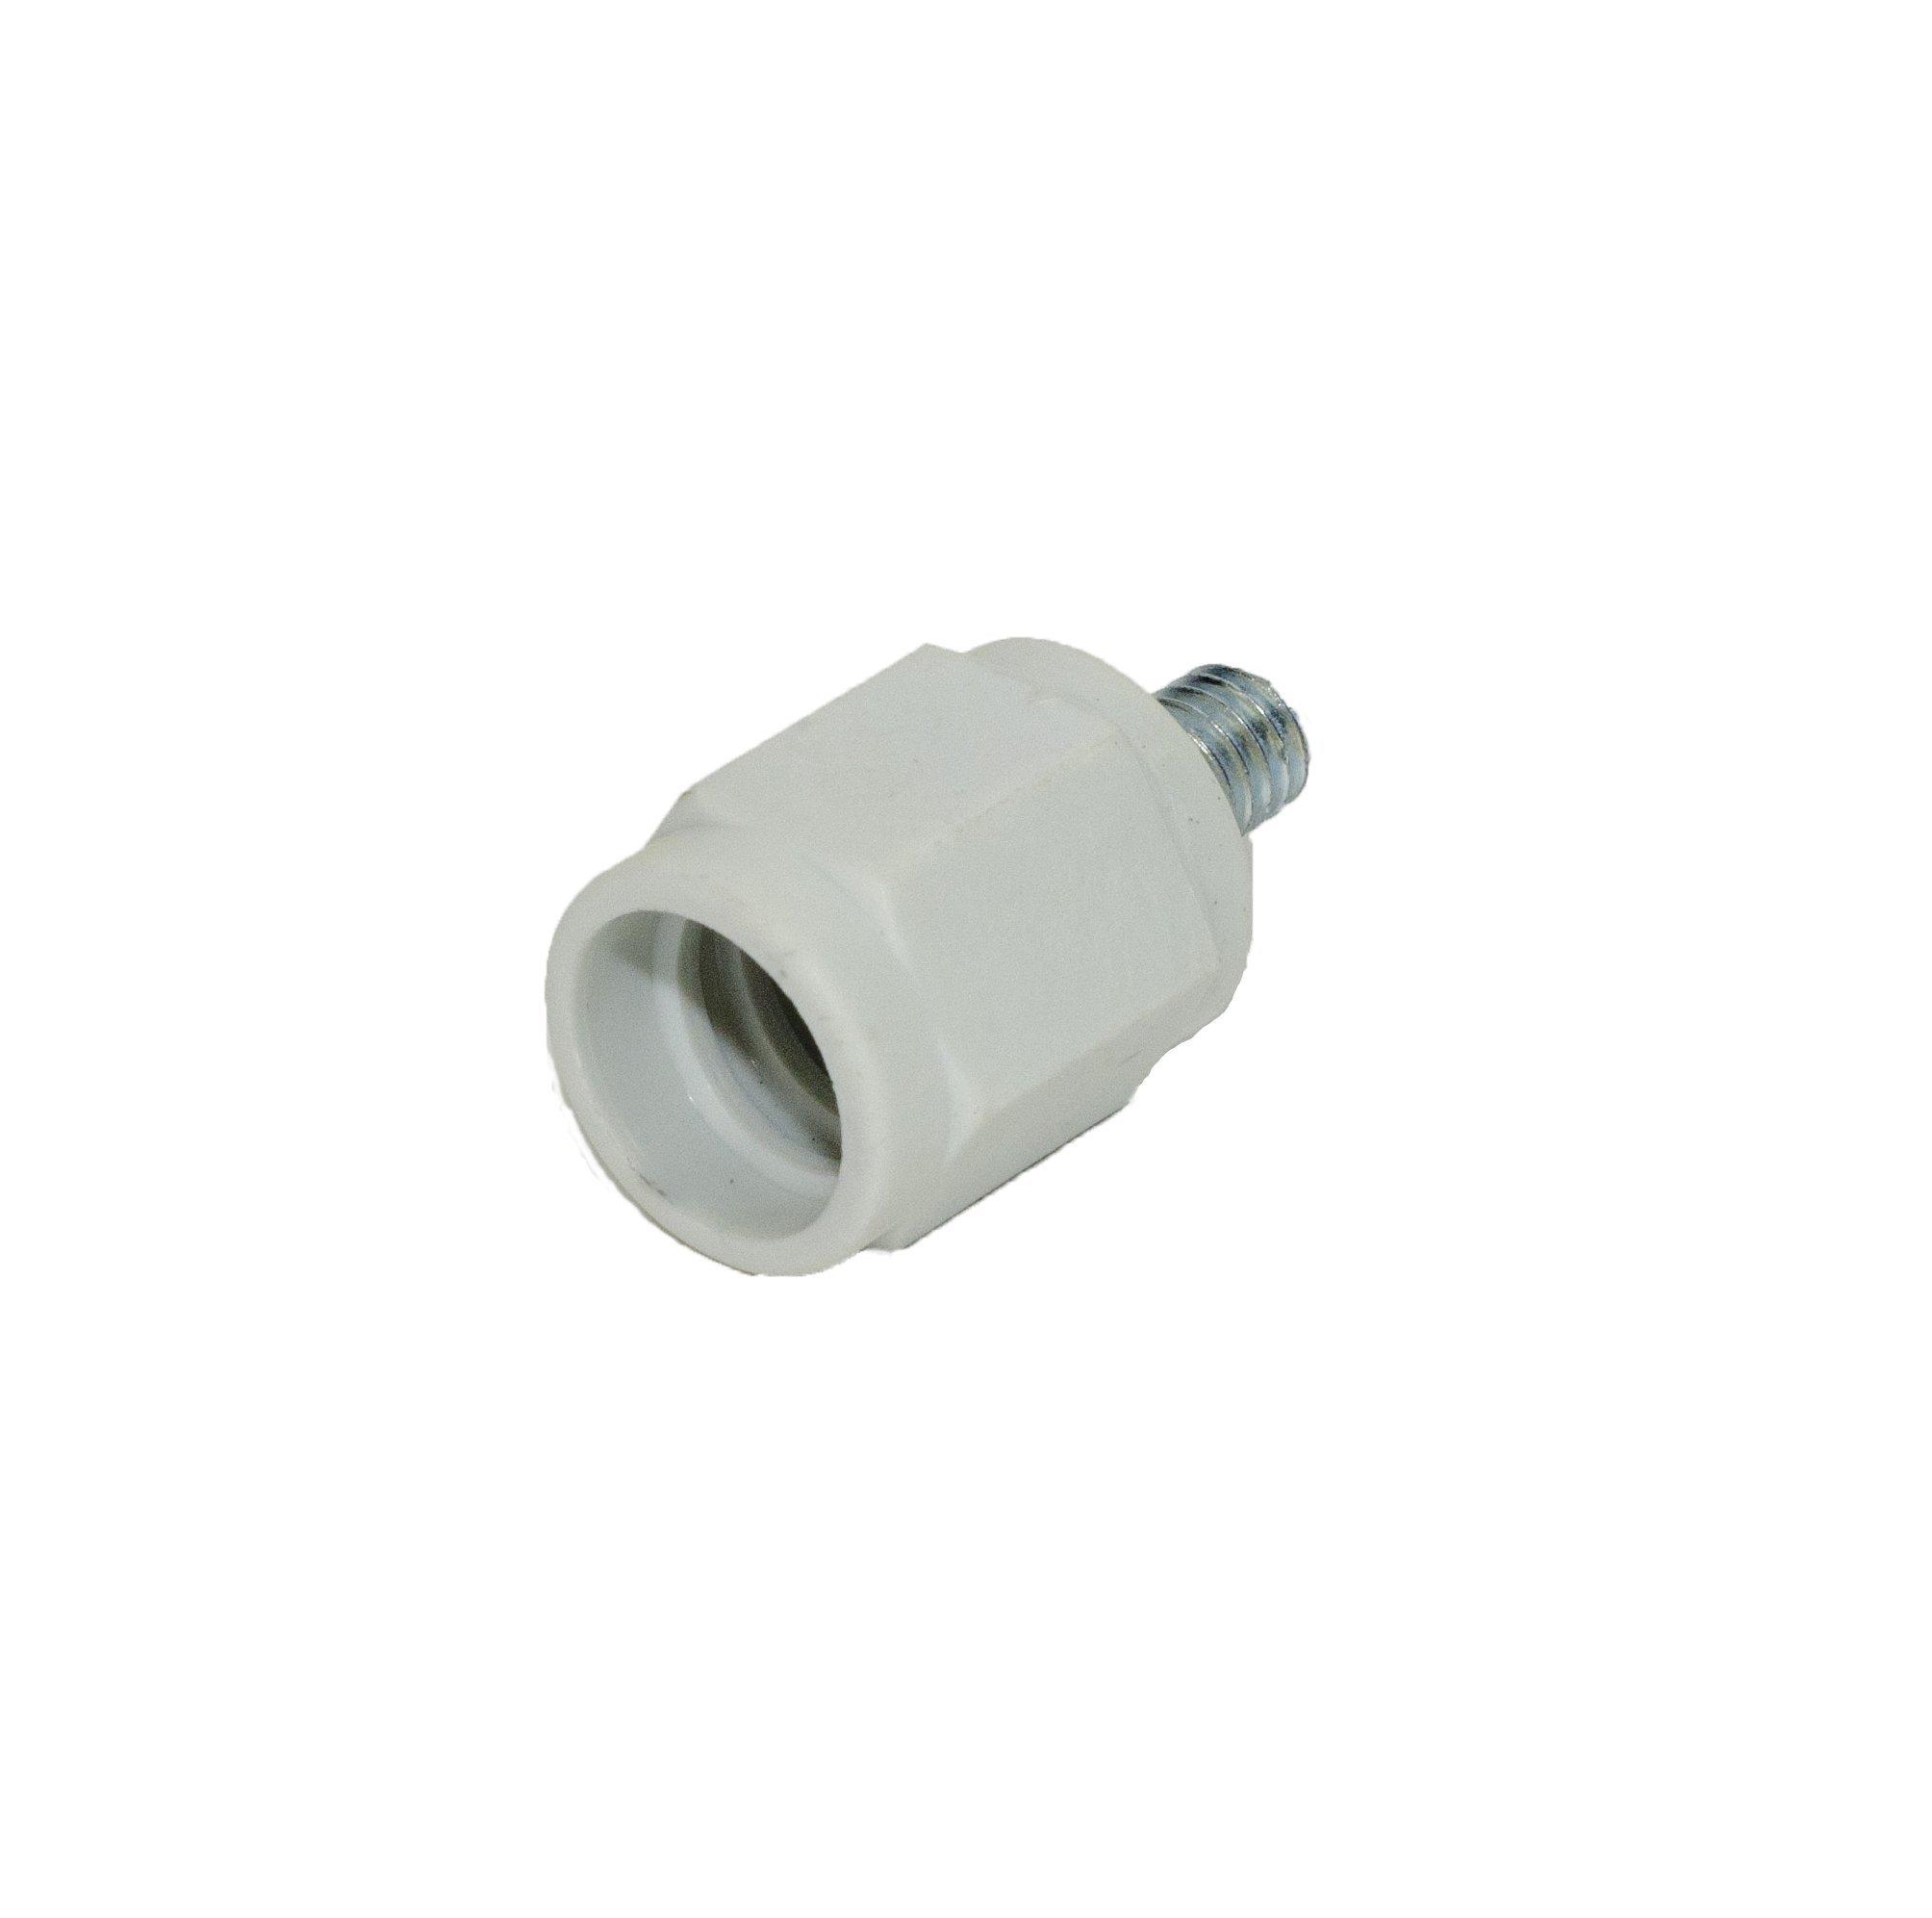 Bon 82-473 Socket Adapter for Concrete Broom